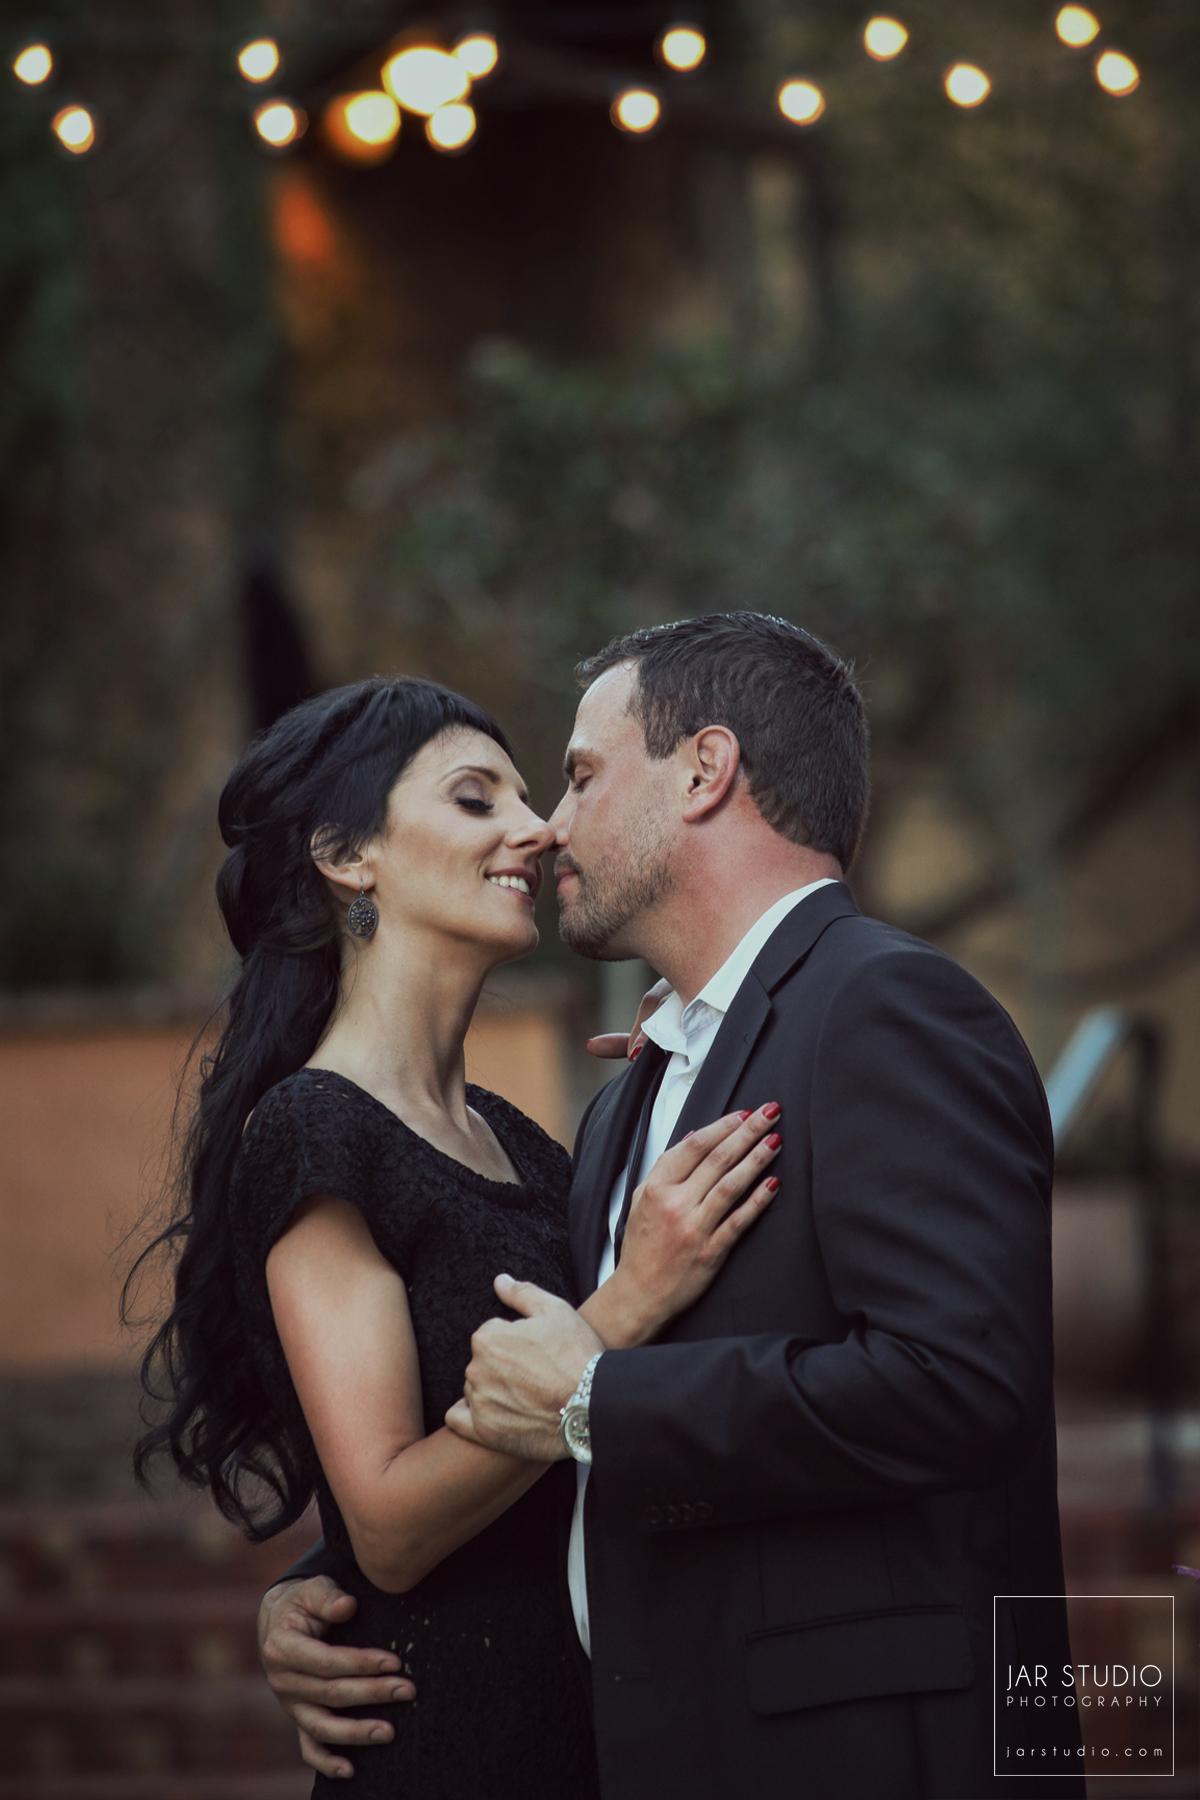 17-romantic-photography-bella-collina-orlando-jarstudio.jpg